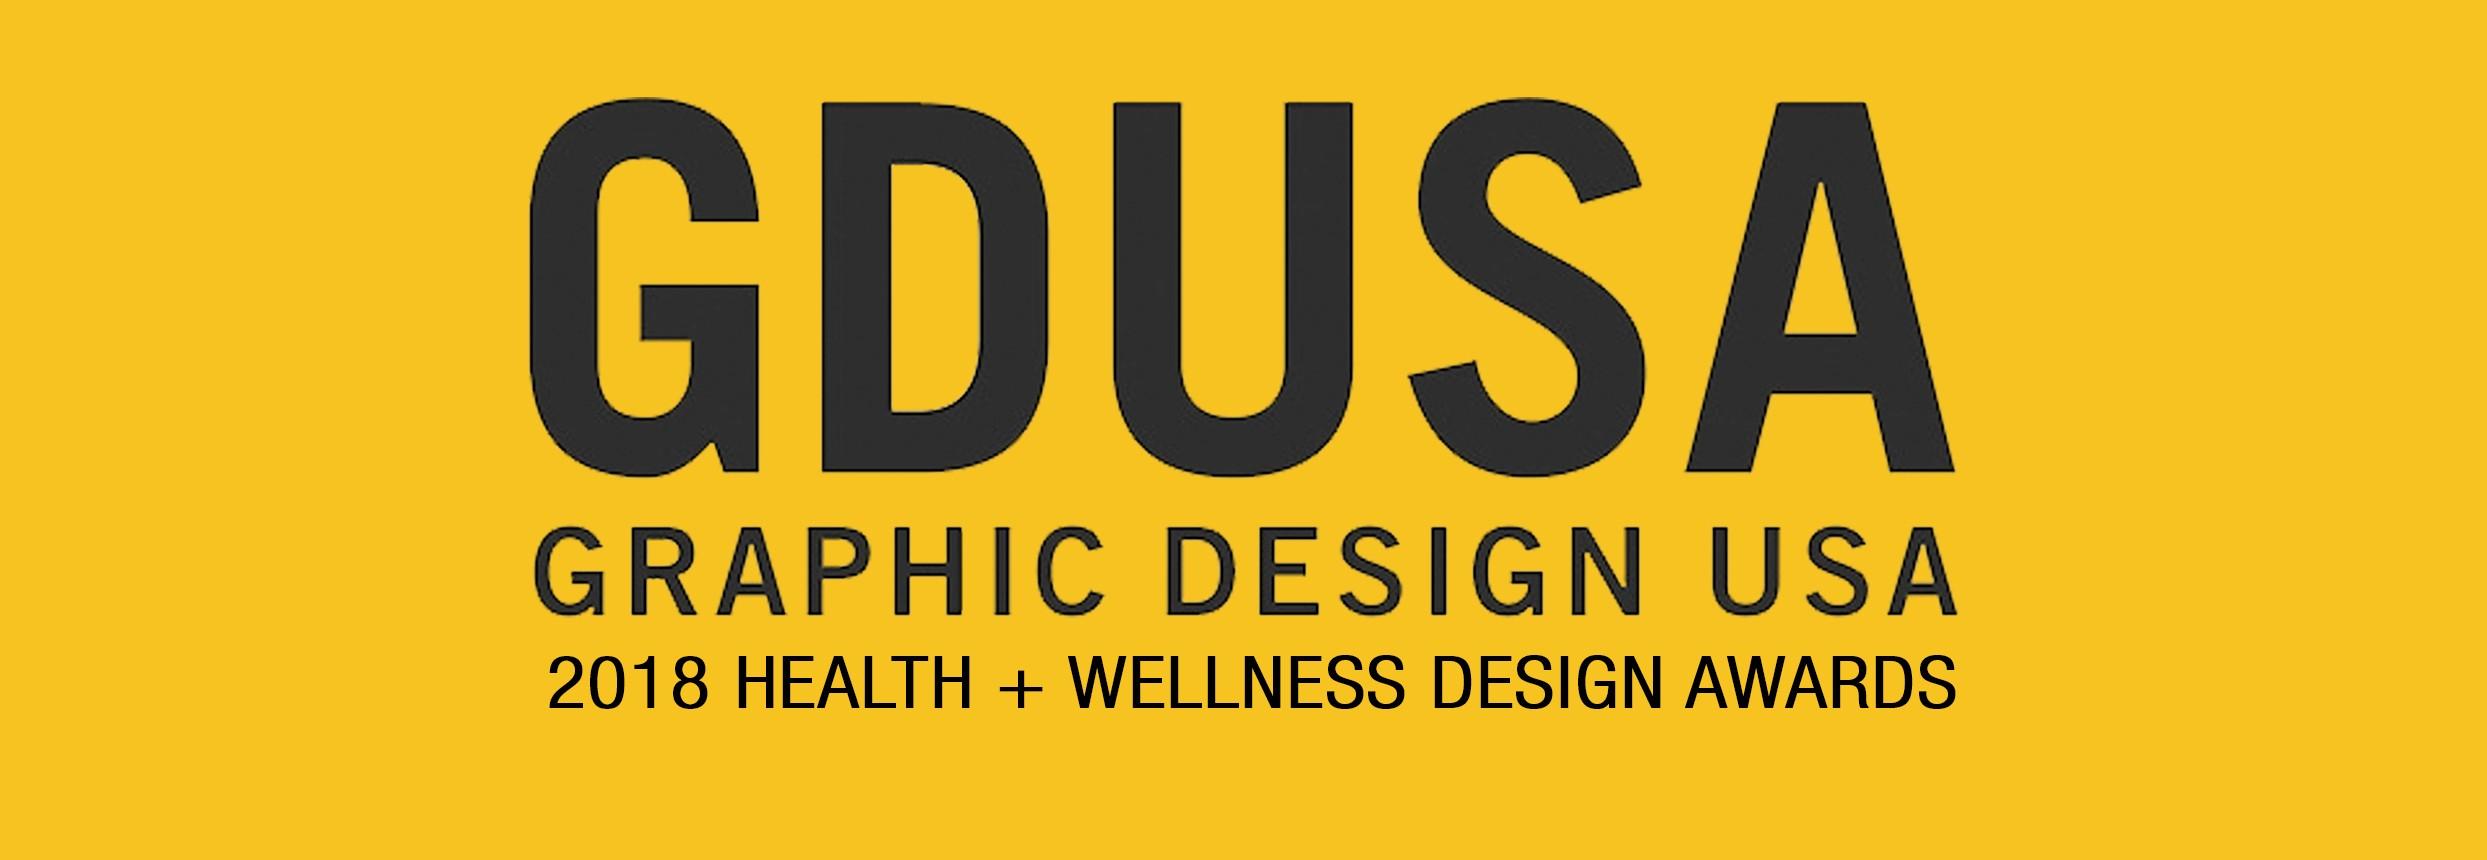 LDM wins 3 Graphic Design USA2018 Health + WellnessAwards!